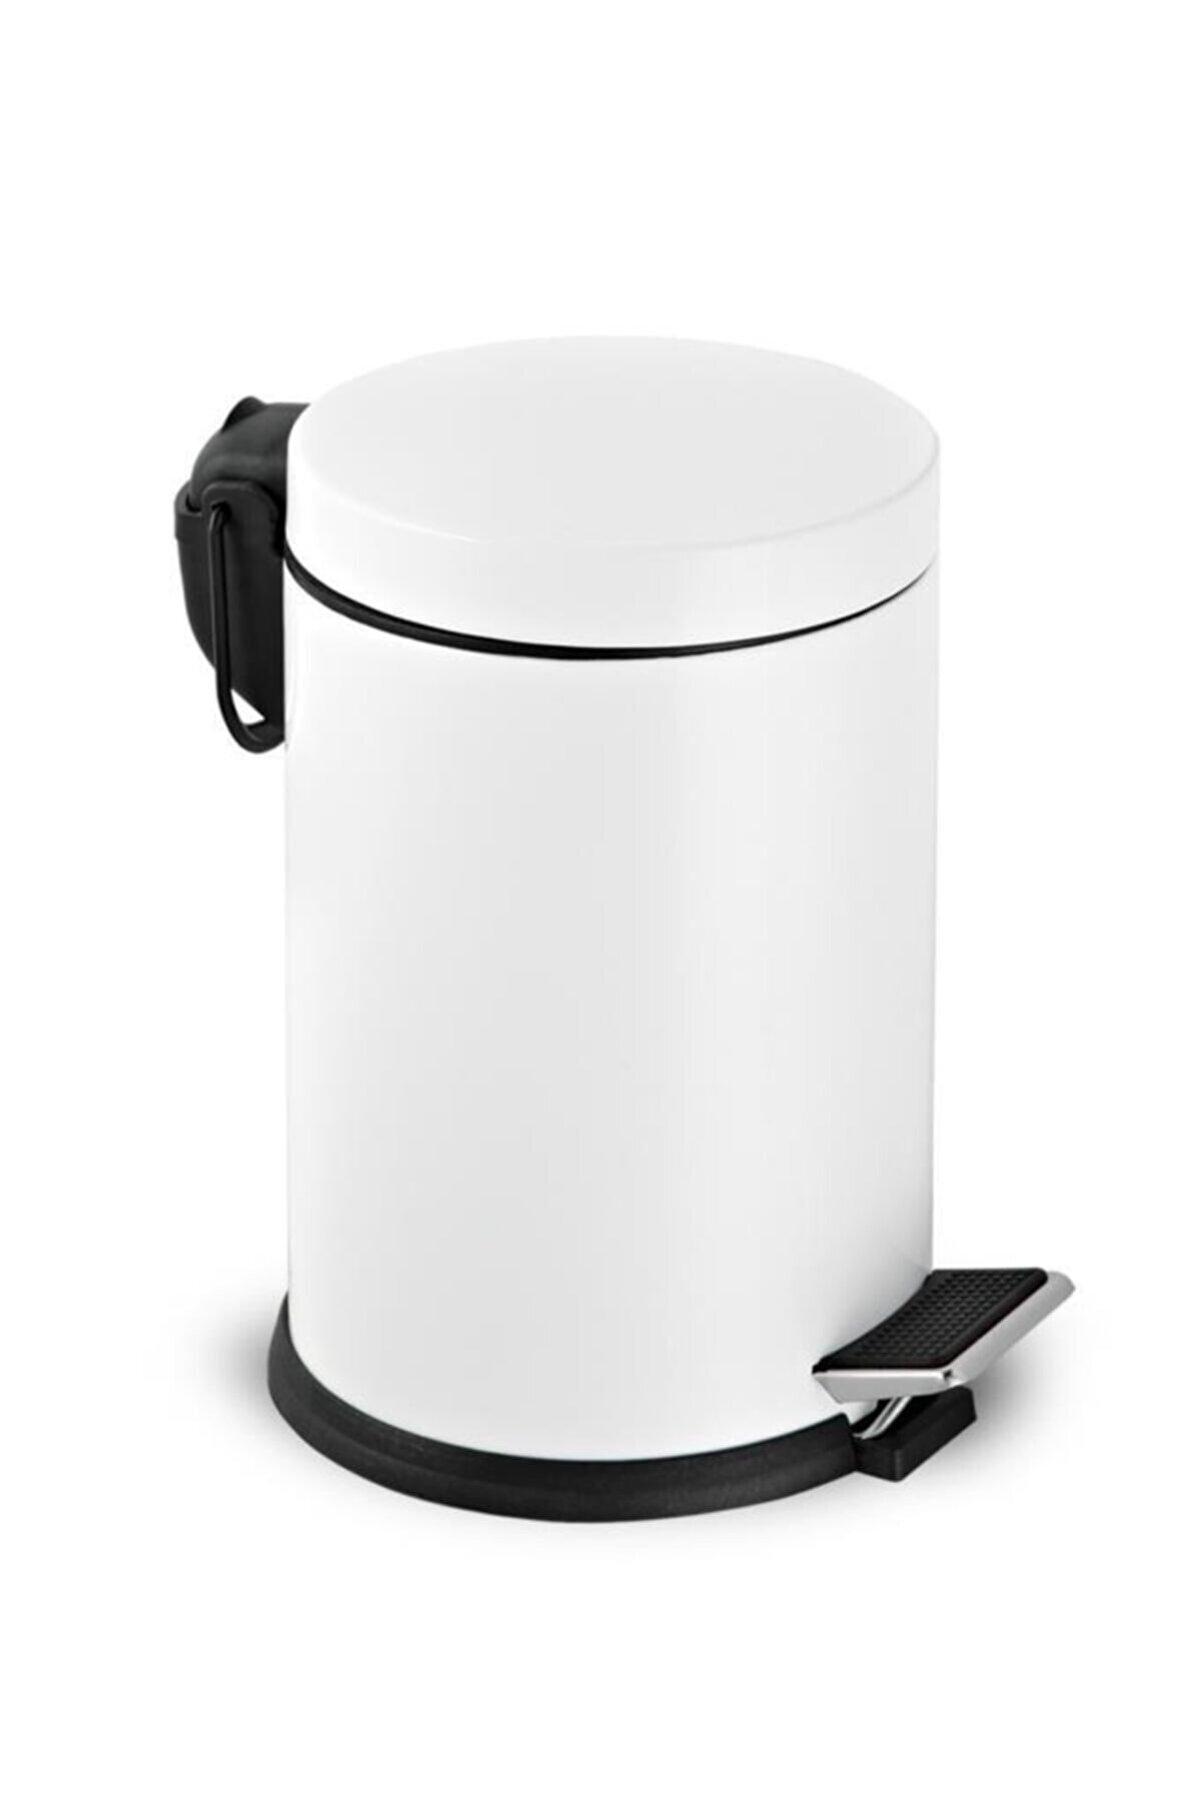 Foreca Beyaz Renkli Pedallı Çöp Kovası 5 Lt